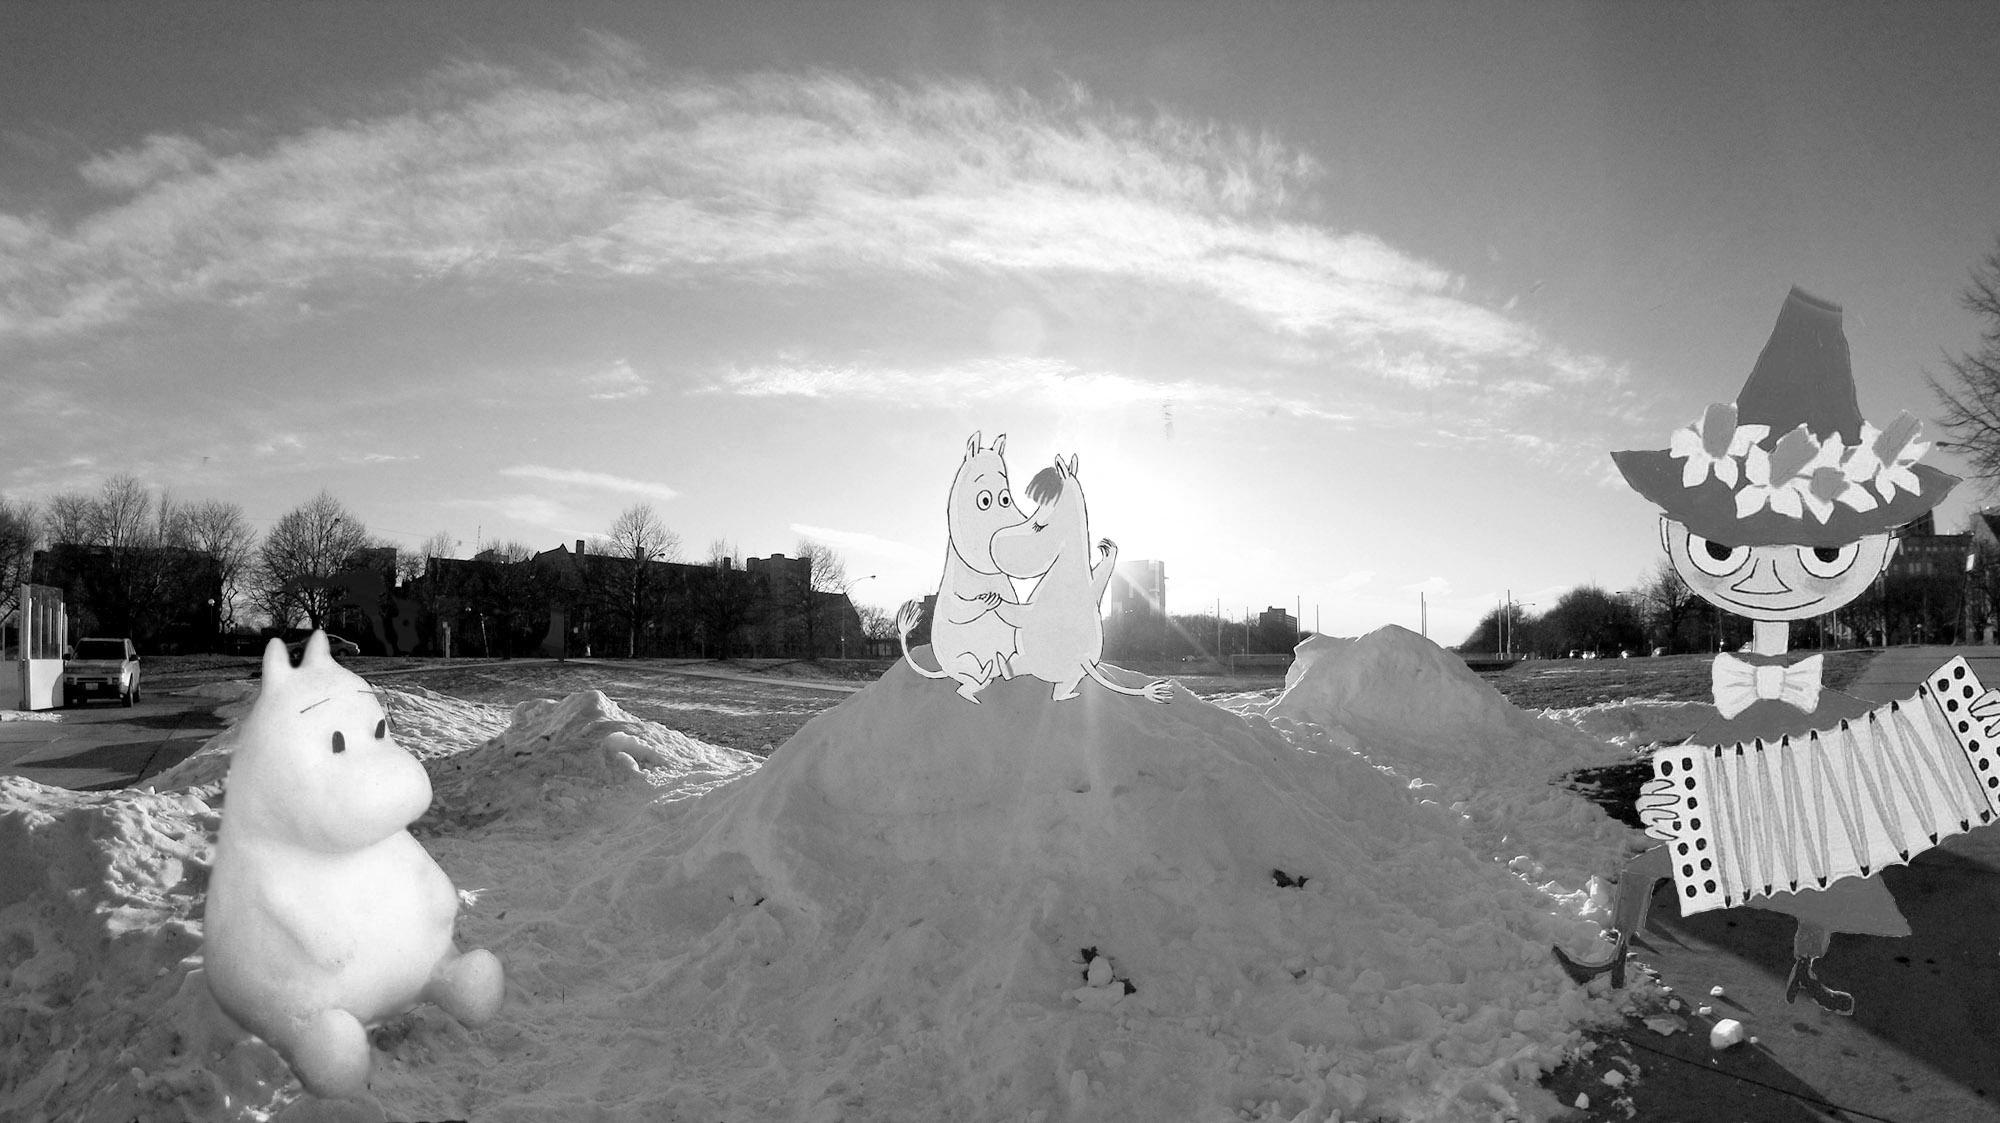 6midway雪人bw